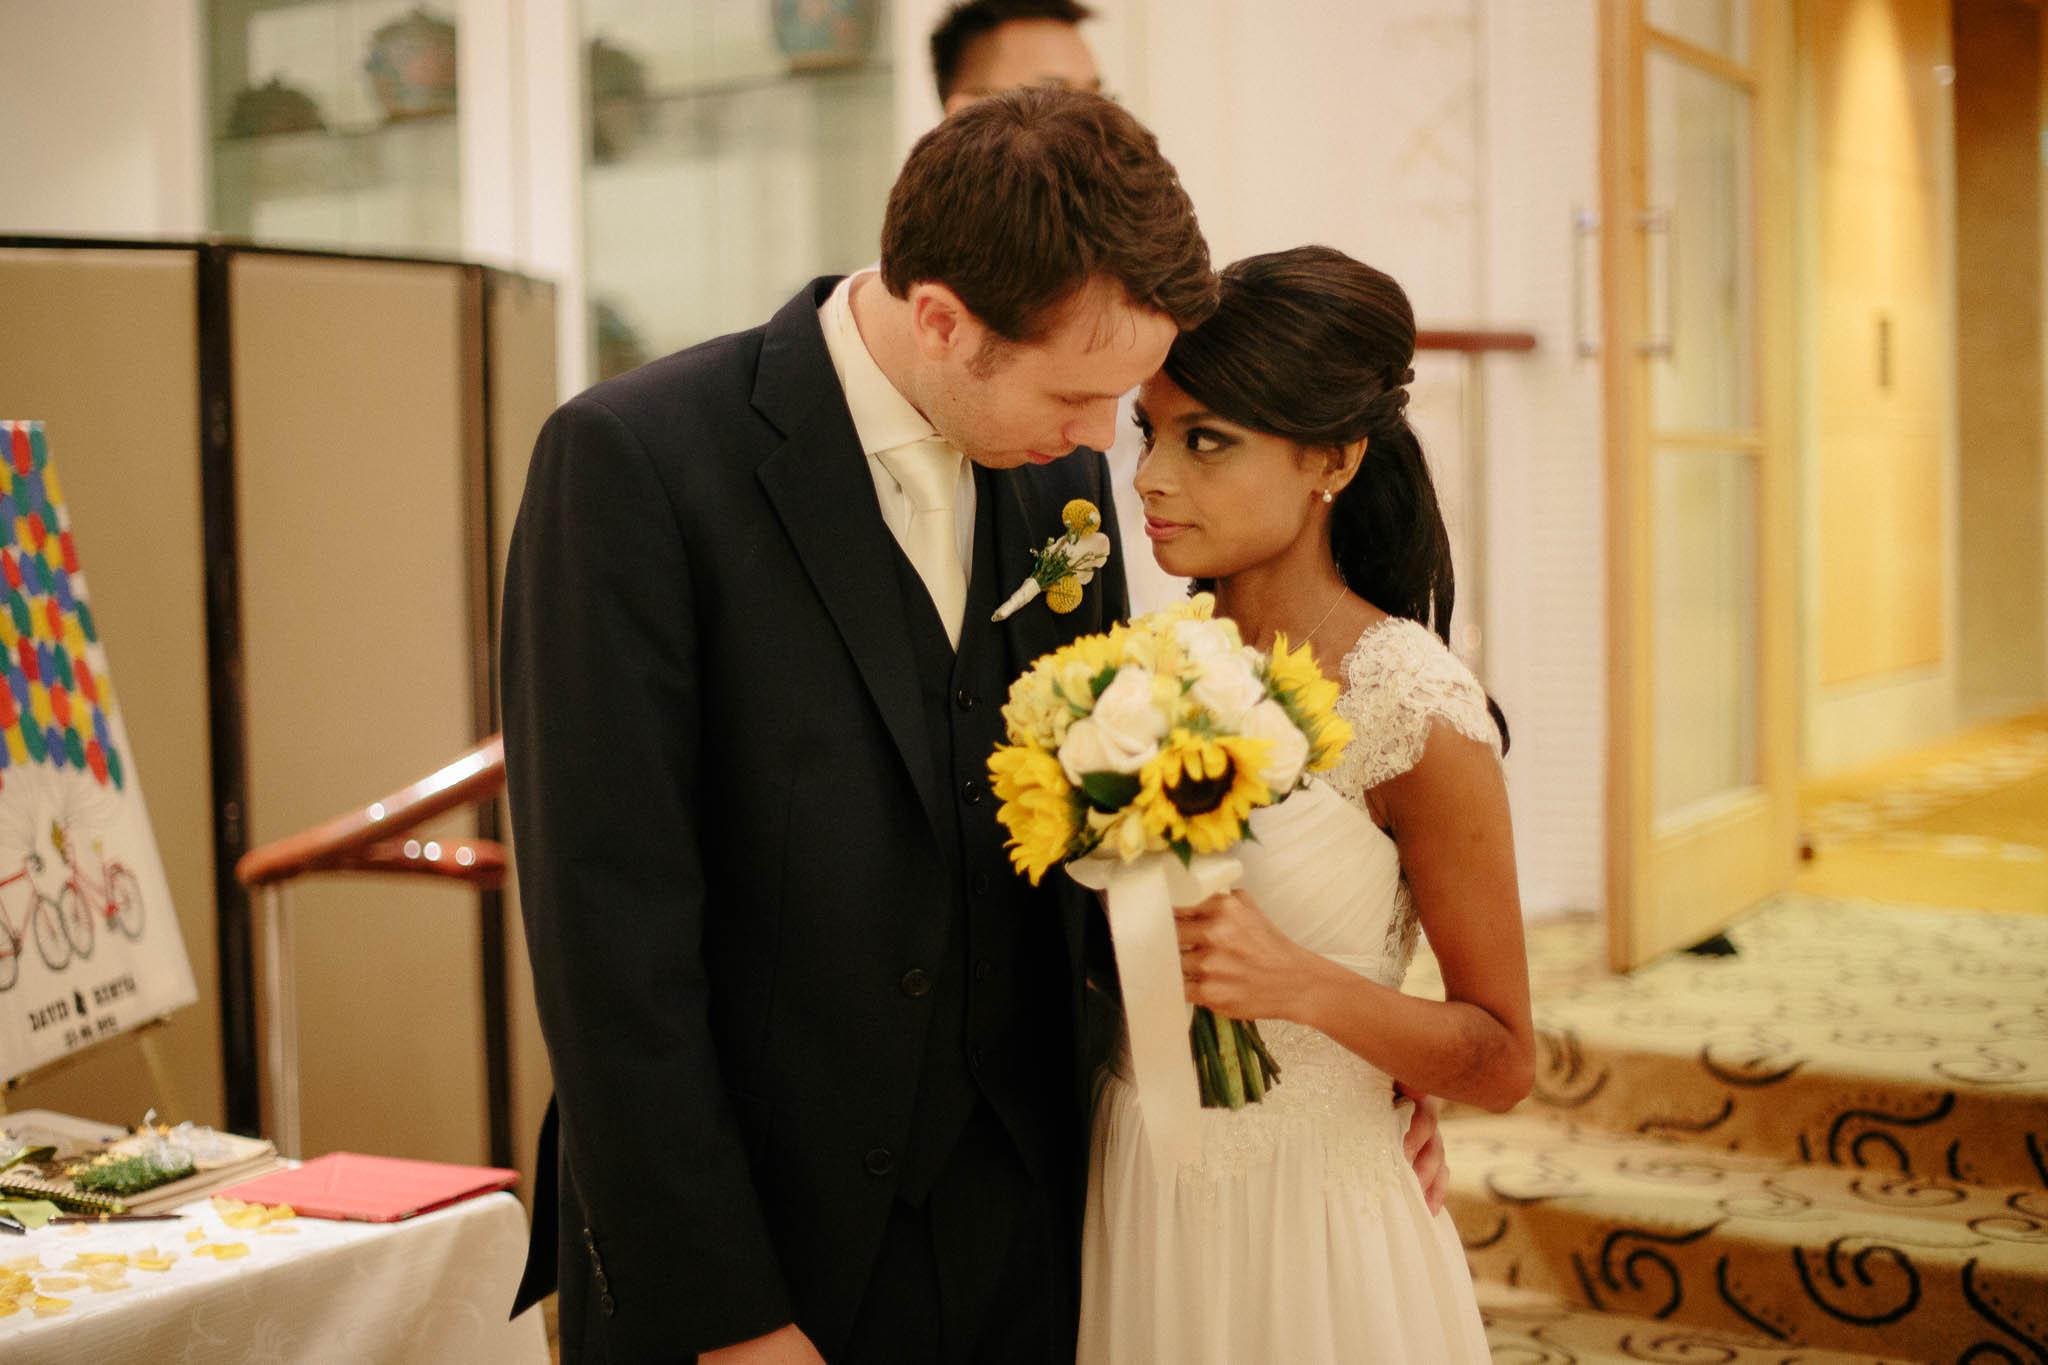 singapore-wedding-photographer-st-andrews-cathedral-renita-david-60.jpg